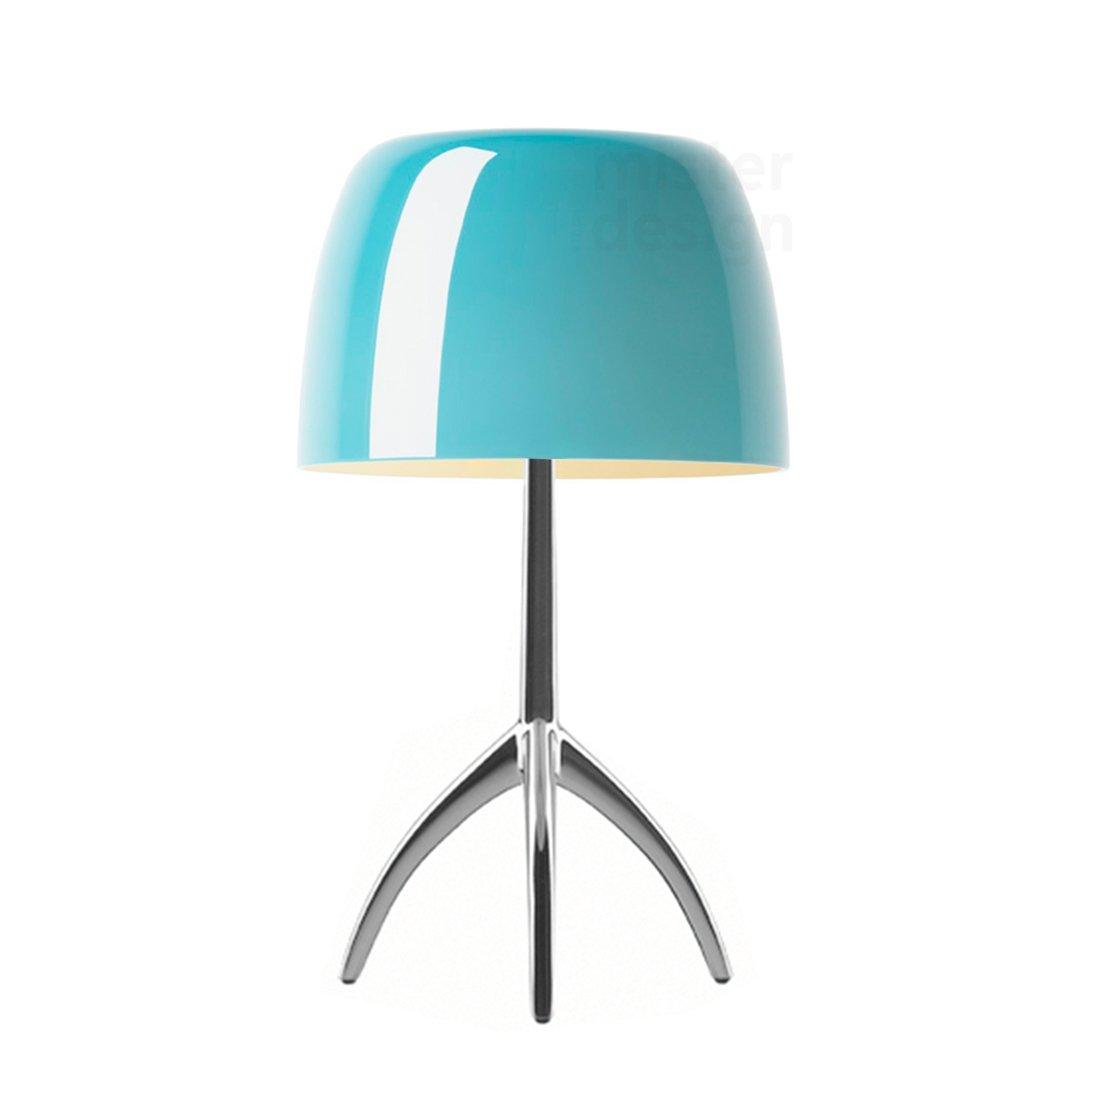 Foscarini Lumiere Piccola Tafellamp Dimbaar - Turquoise - Aluminium